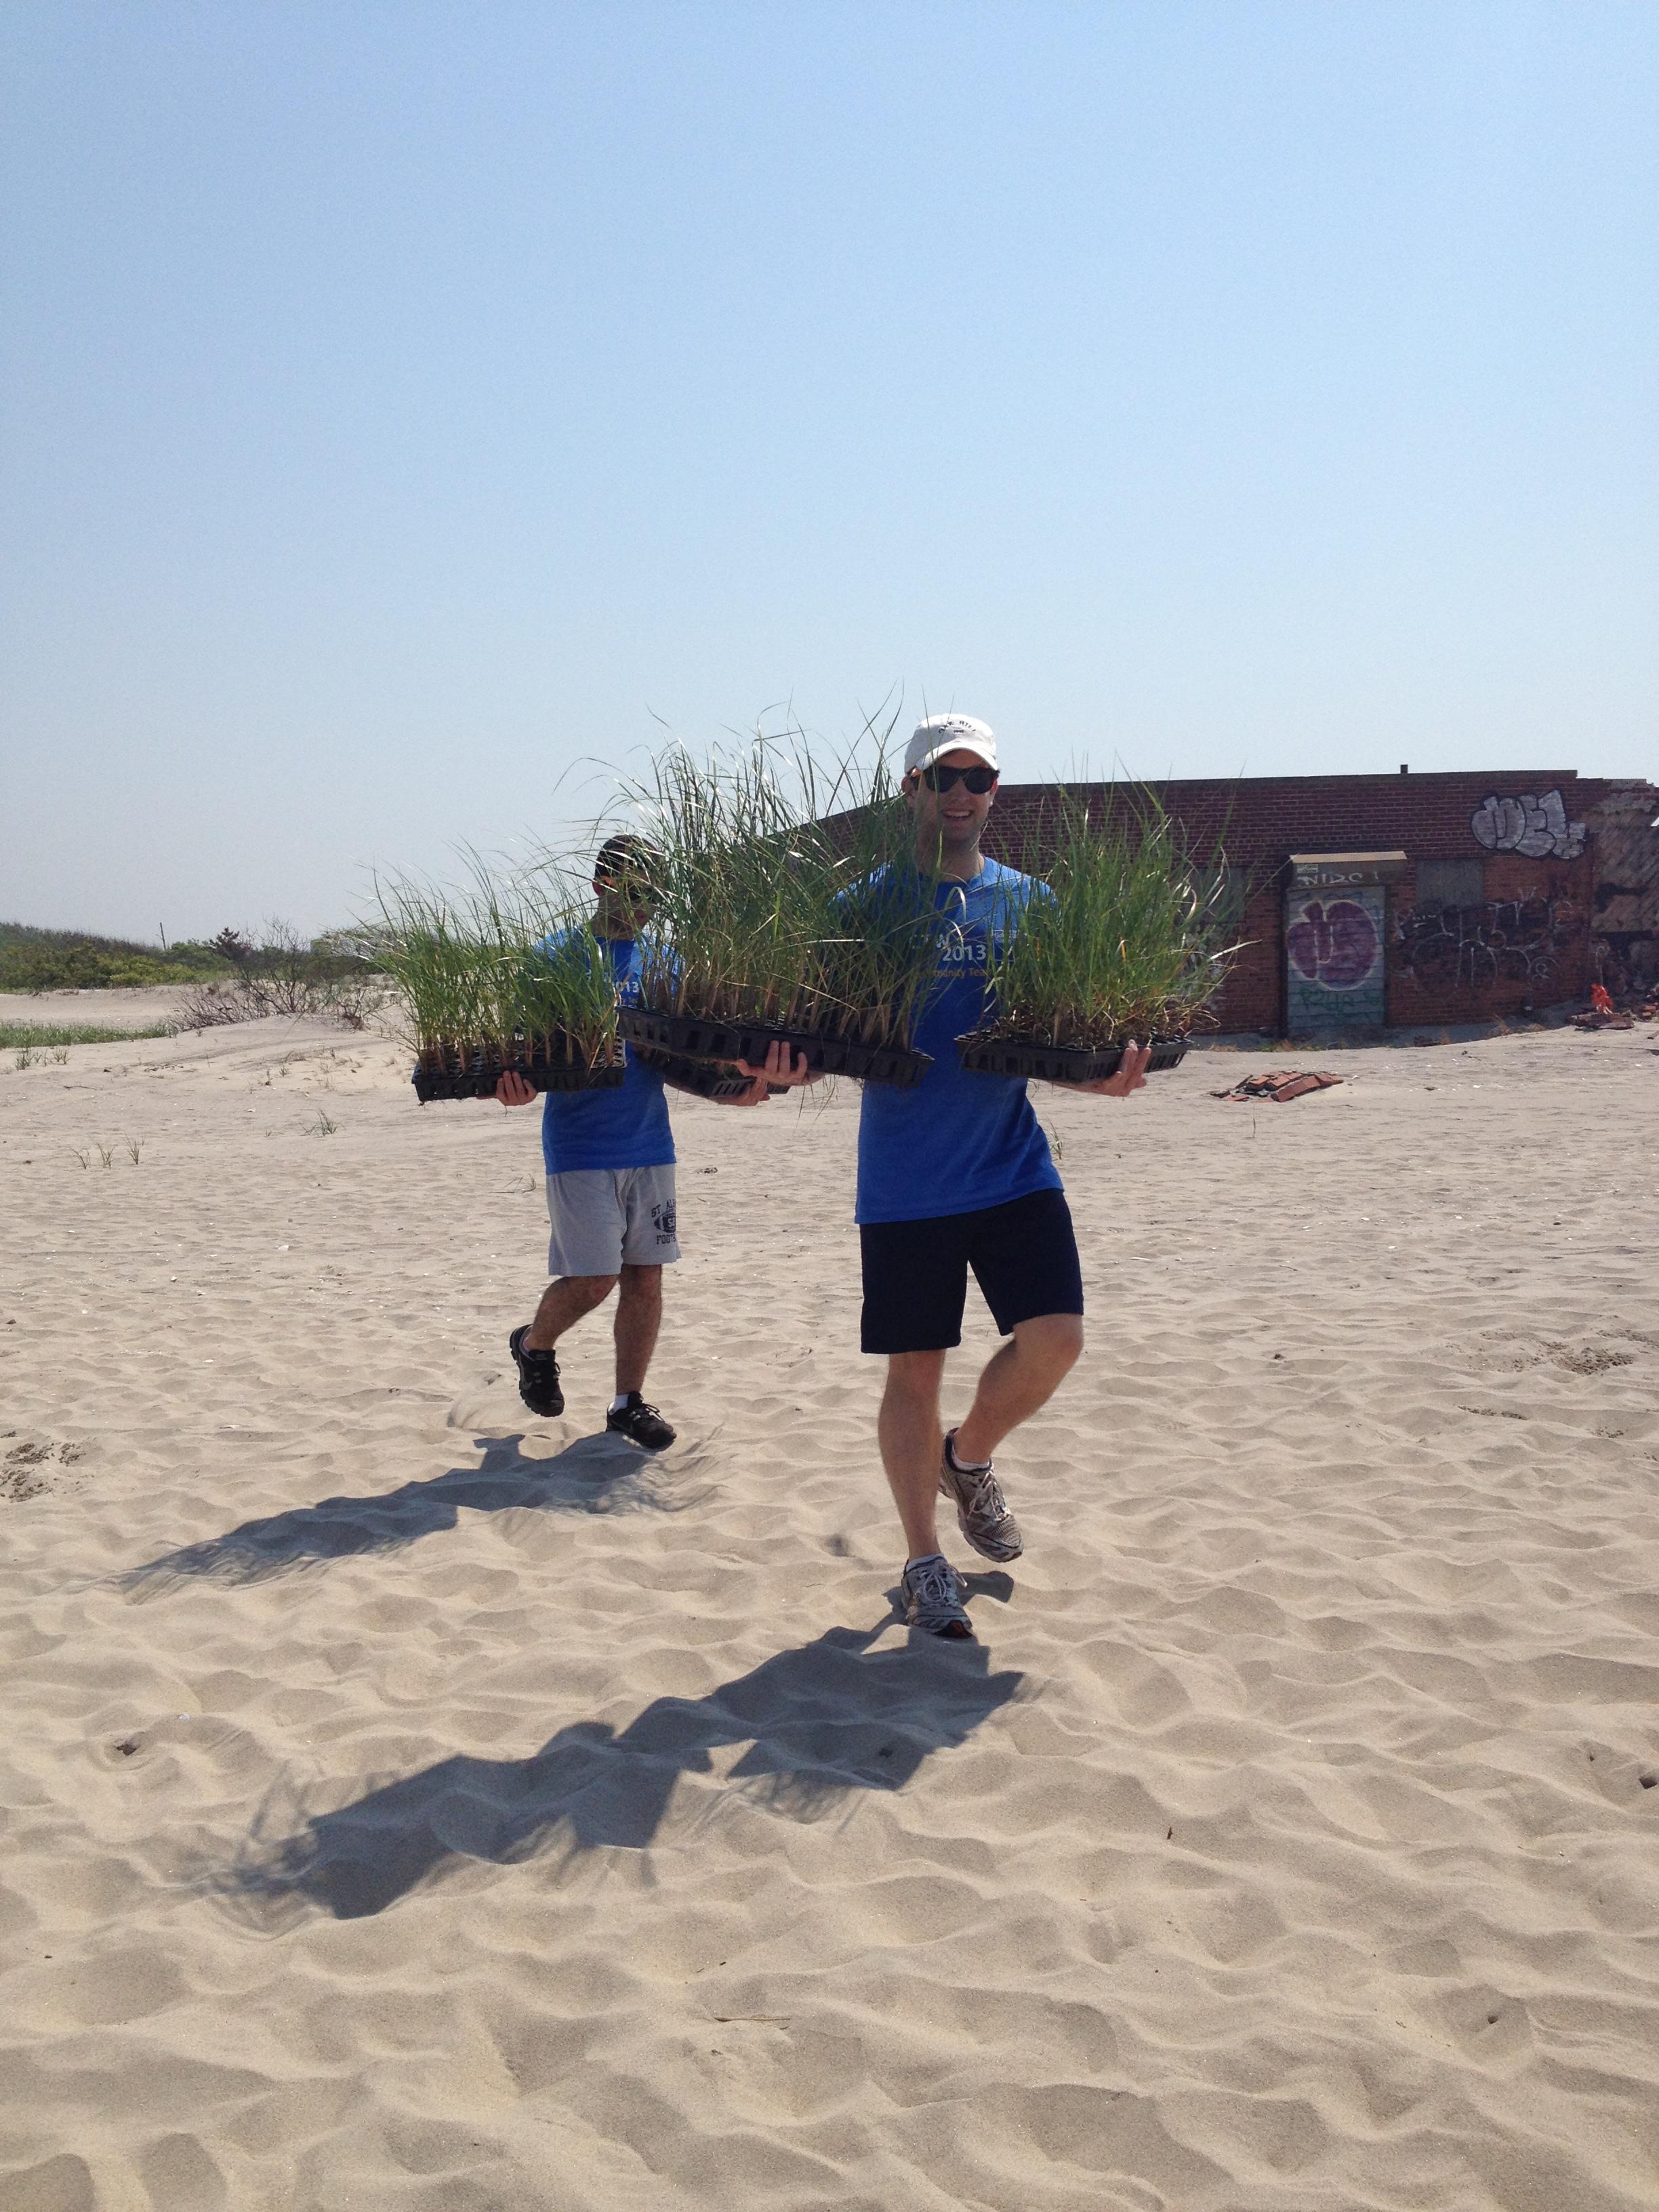 Volunteering at Rockaway Beach after hurricane Sandy